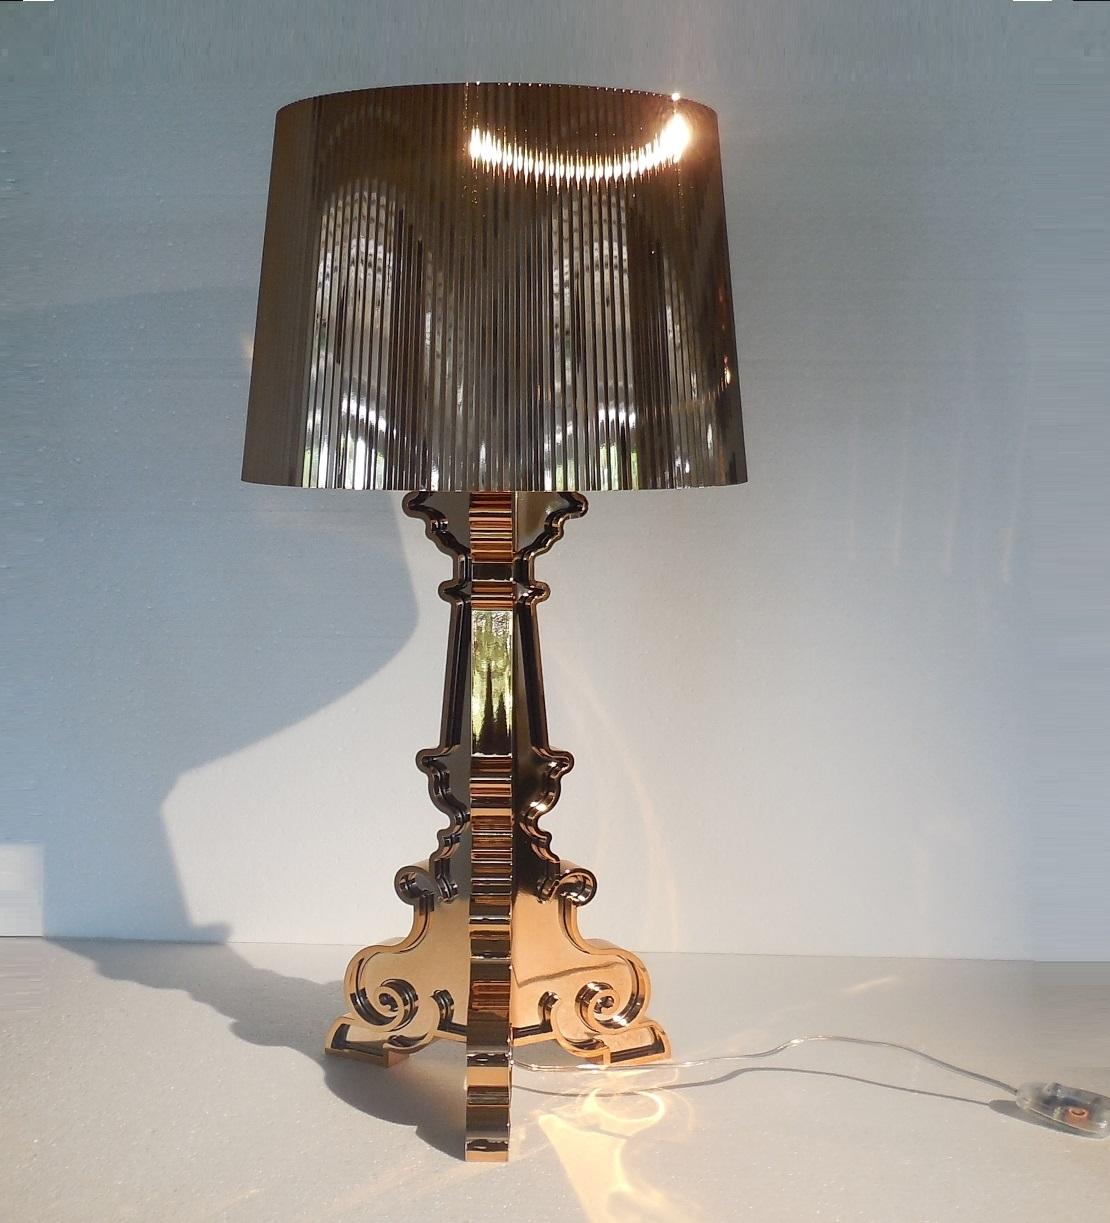 Illuminazione kartell bourgie rame lampada da tavolo for Lampade kartell outlet